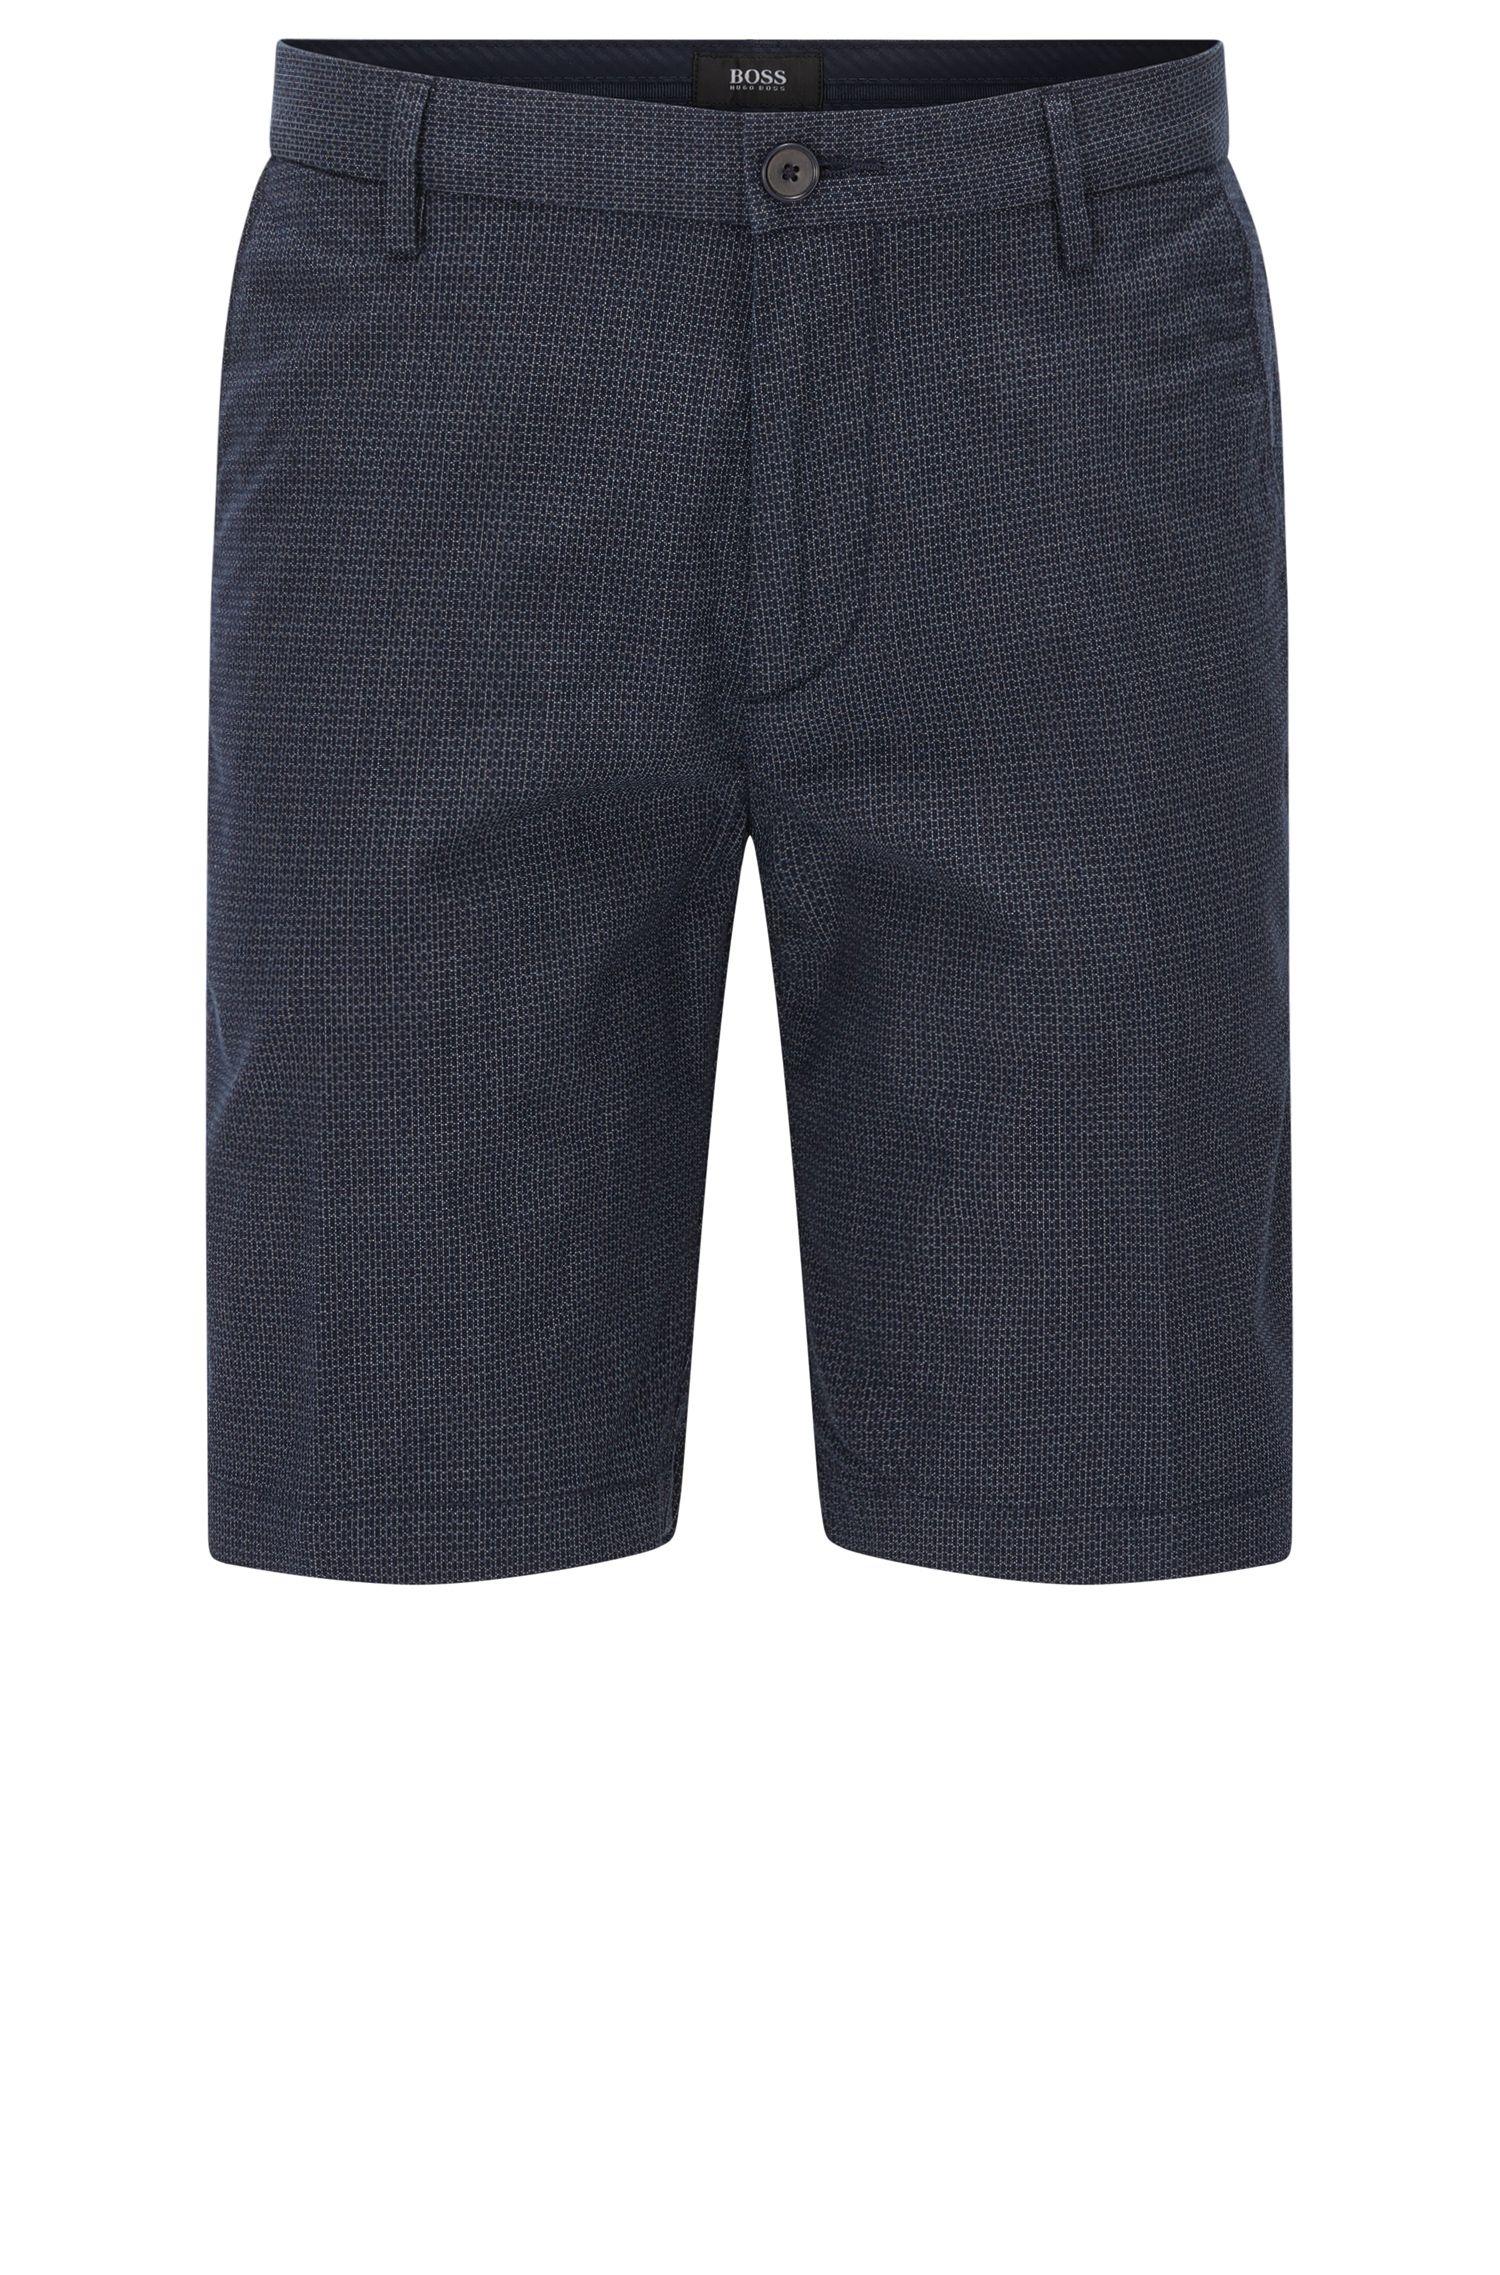 'Rice Short W'   Slim Fit, Italian Stretch Cotton Shorts